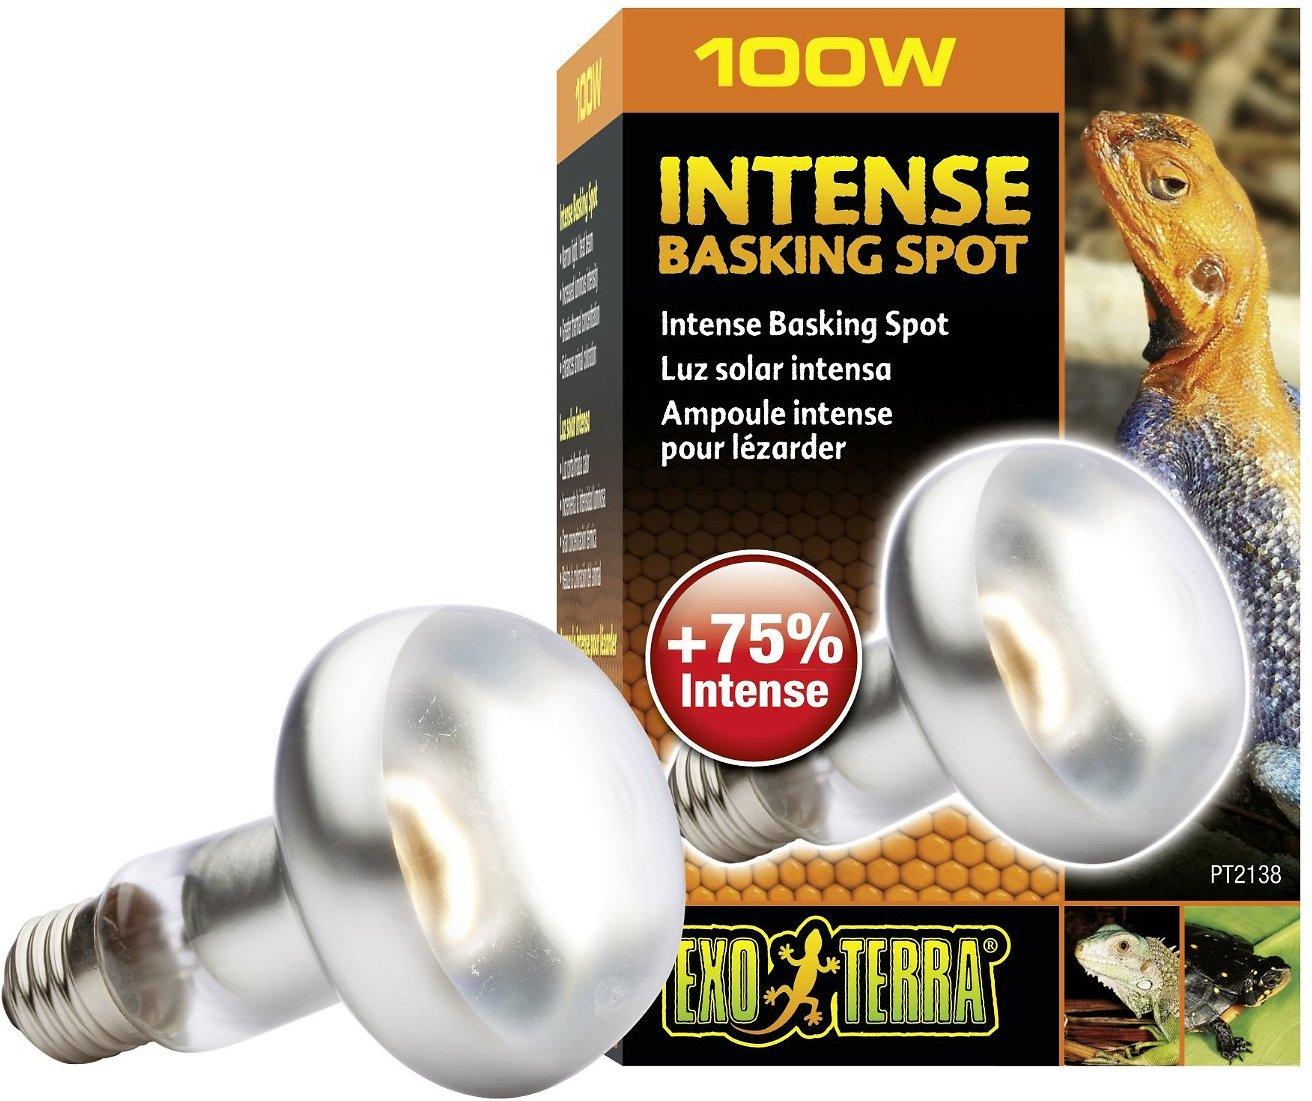 Exo Terra Intense Basking Reptile Spot Lamp Image